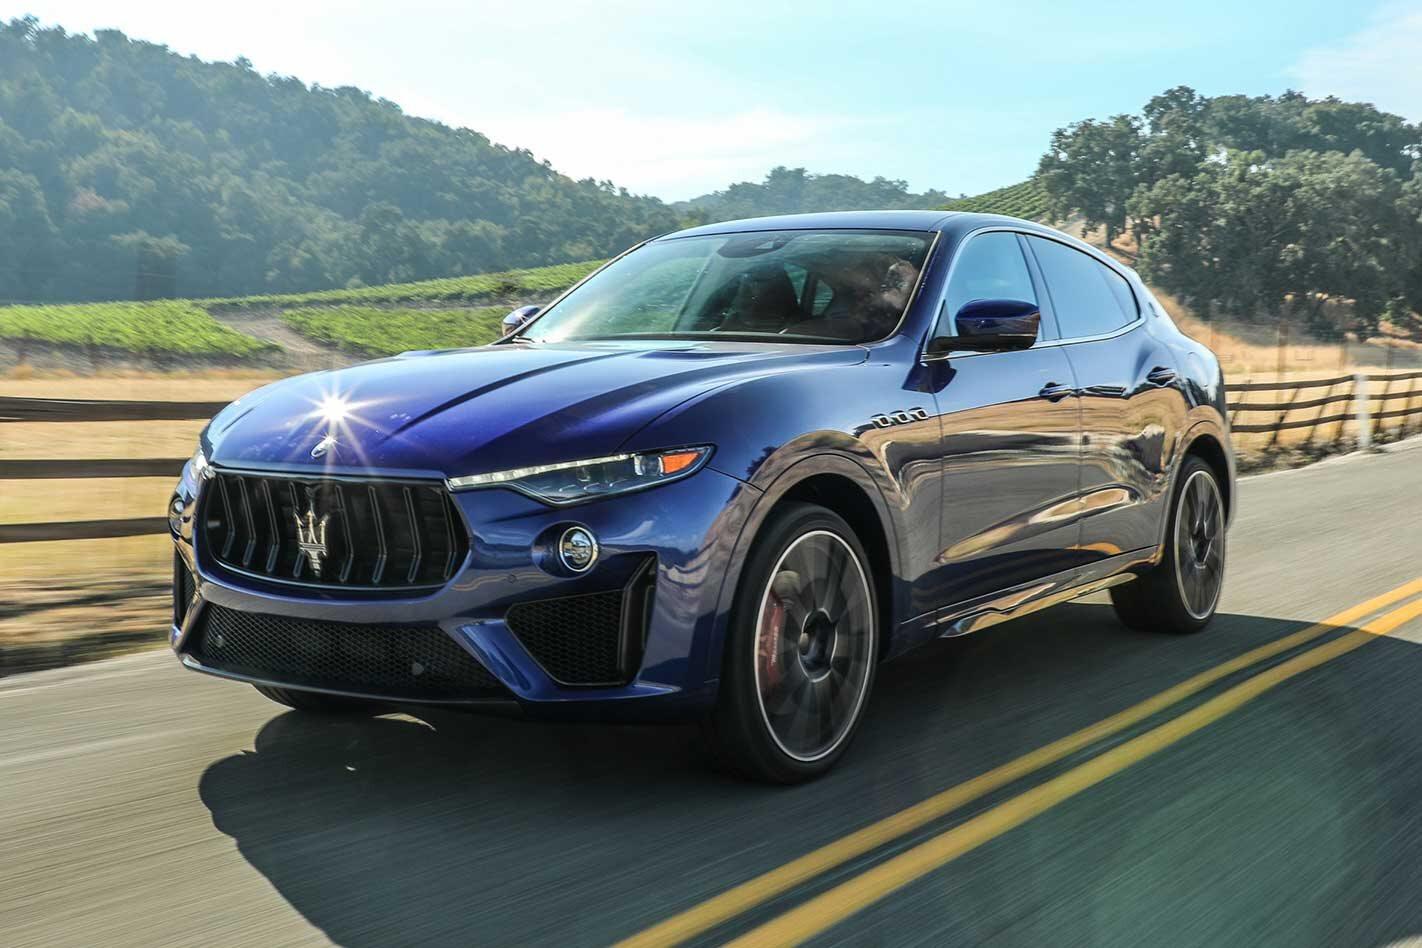 2019 Maserati Levante Trofeo Performance Review Jpg